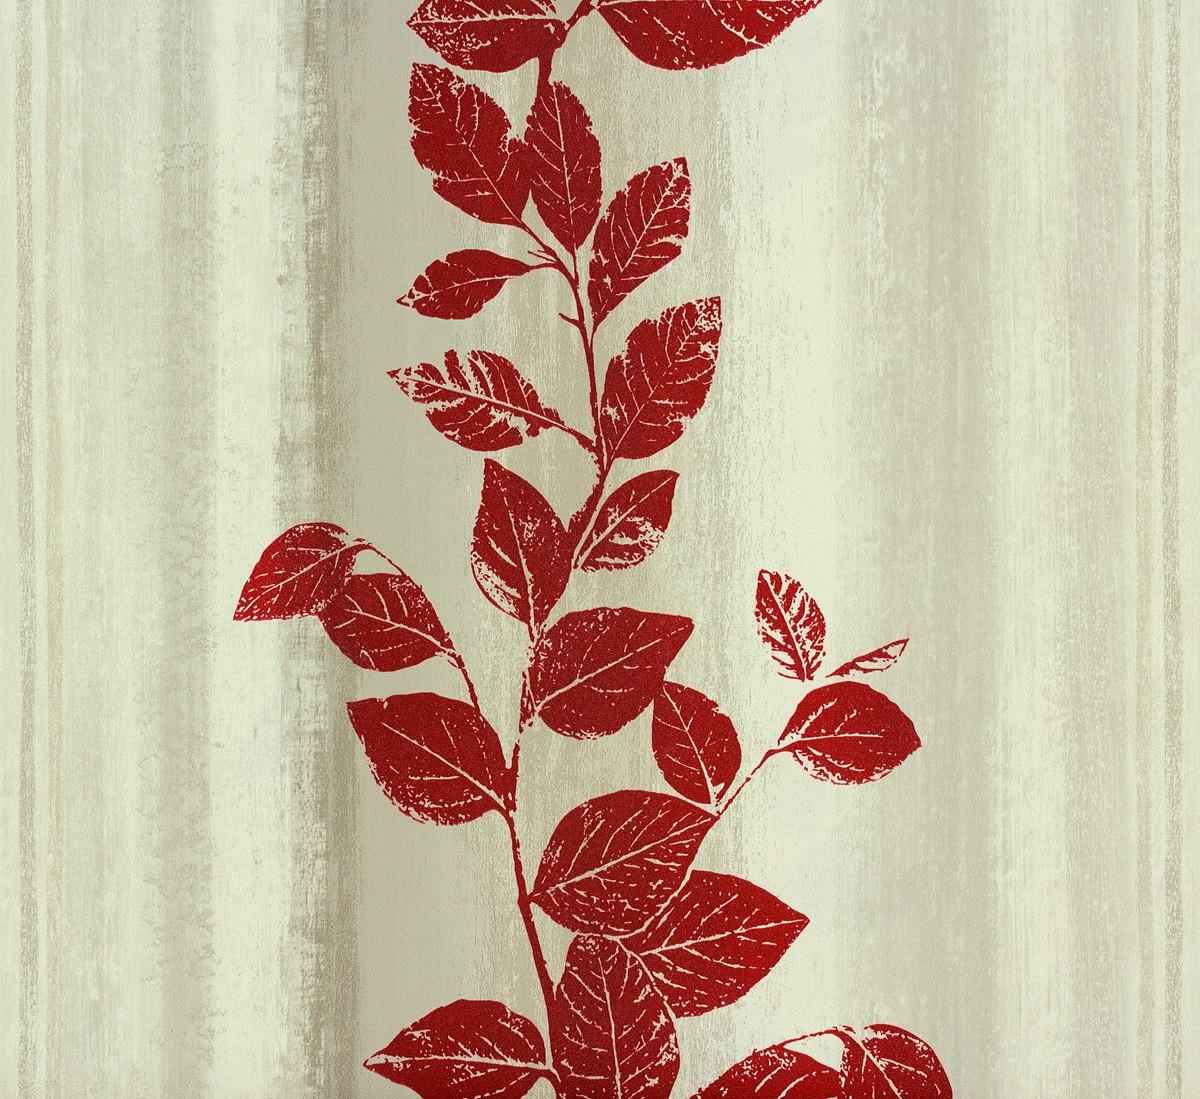 vliestapete struktur blumen grau rot tapete rasch fiducia 424720. Black Bedroom Furniture Sets. Home Design Ideas